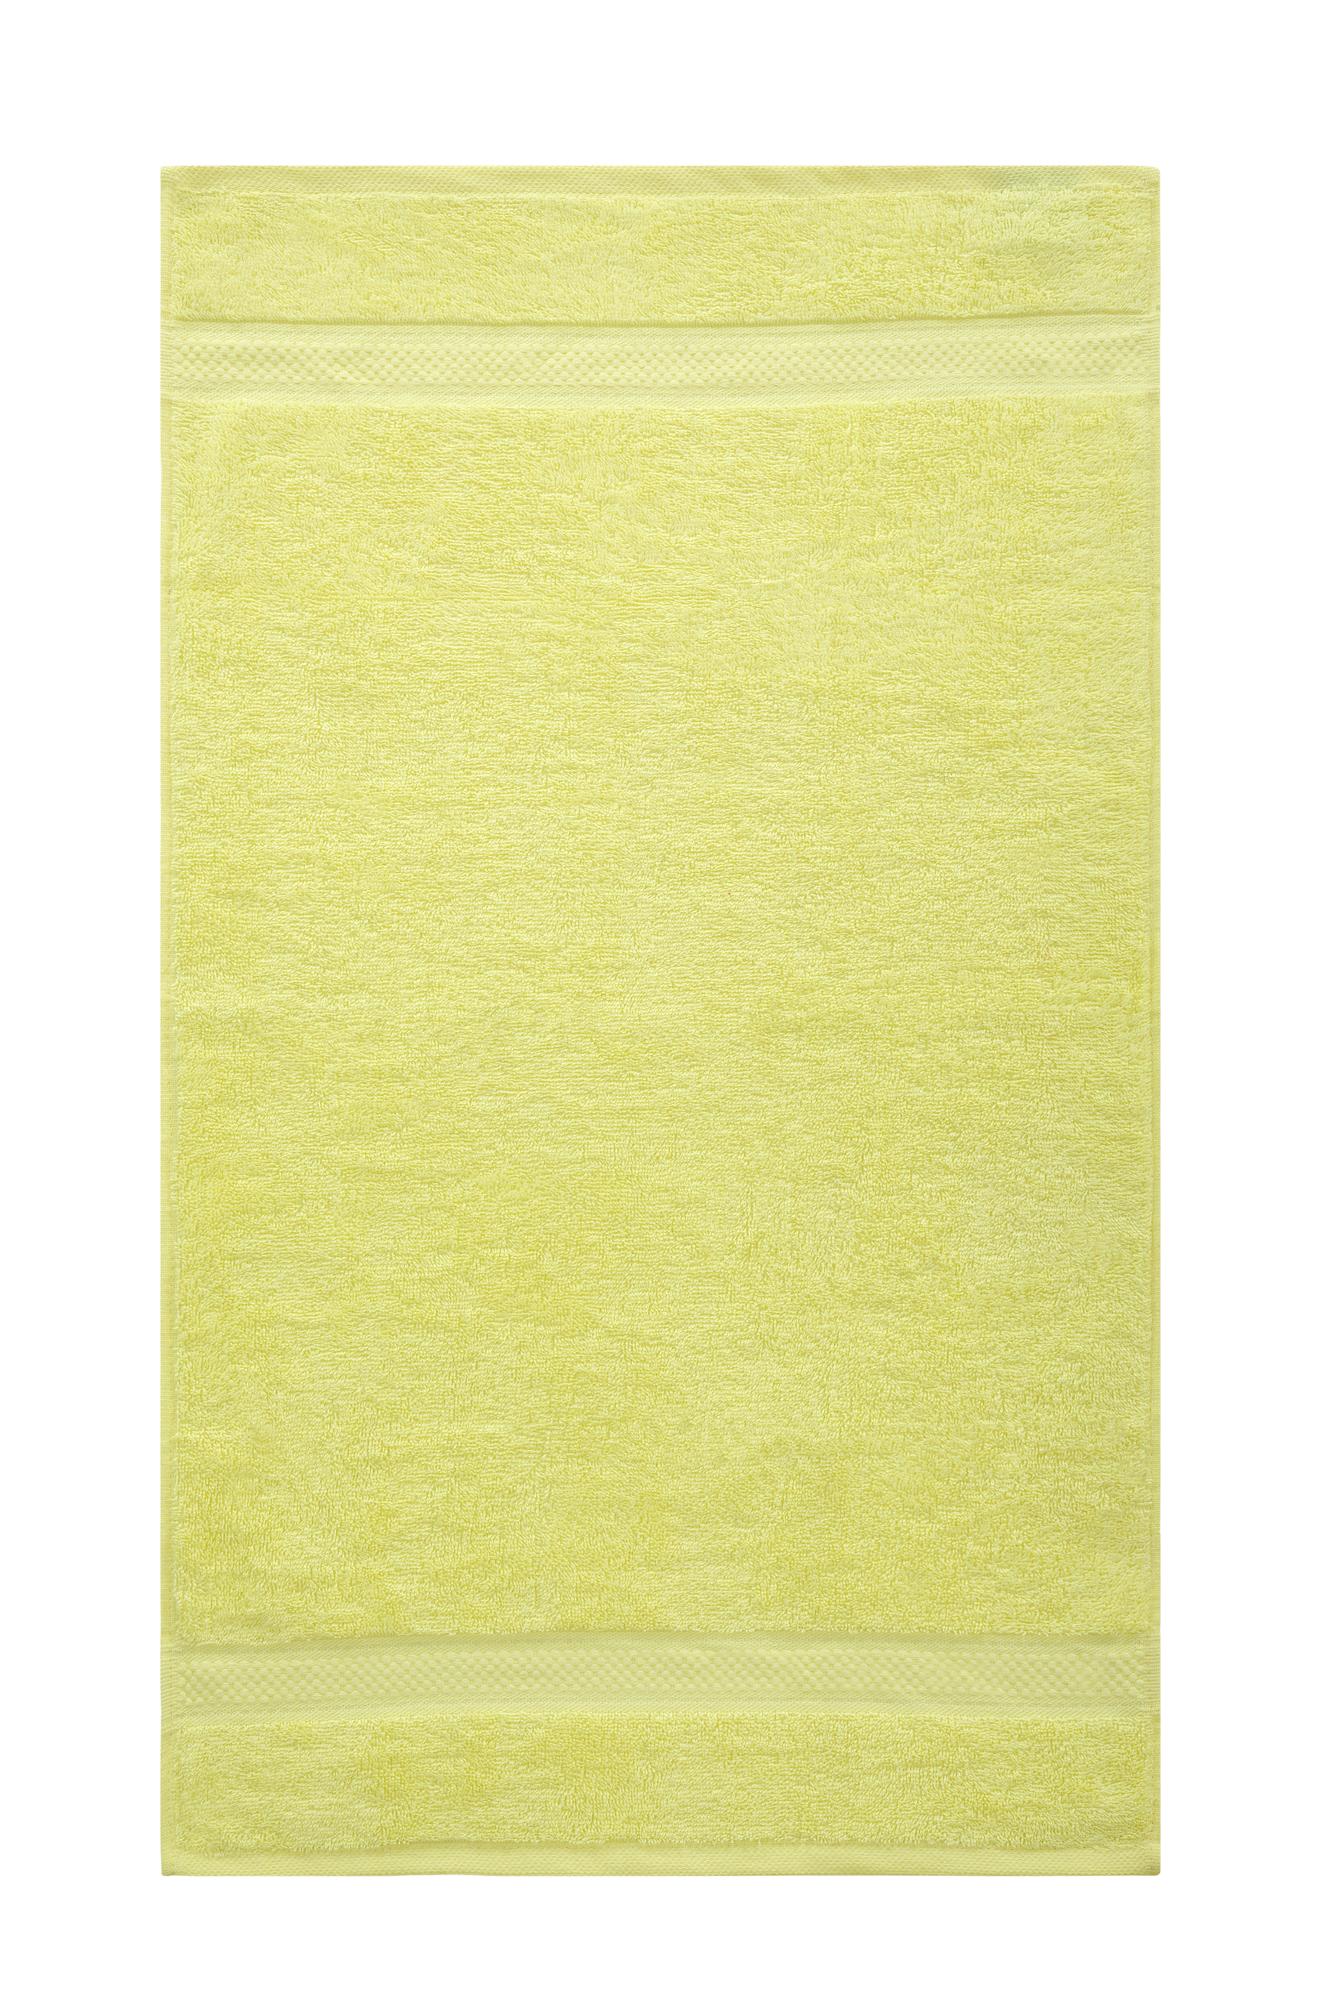 Bale Set 4pcs Lemon Plain Hand Towel